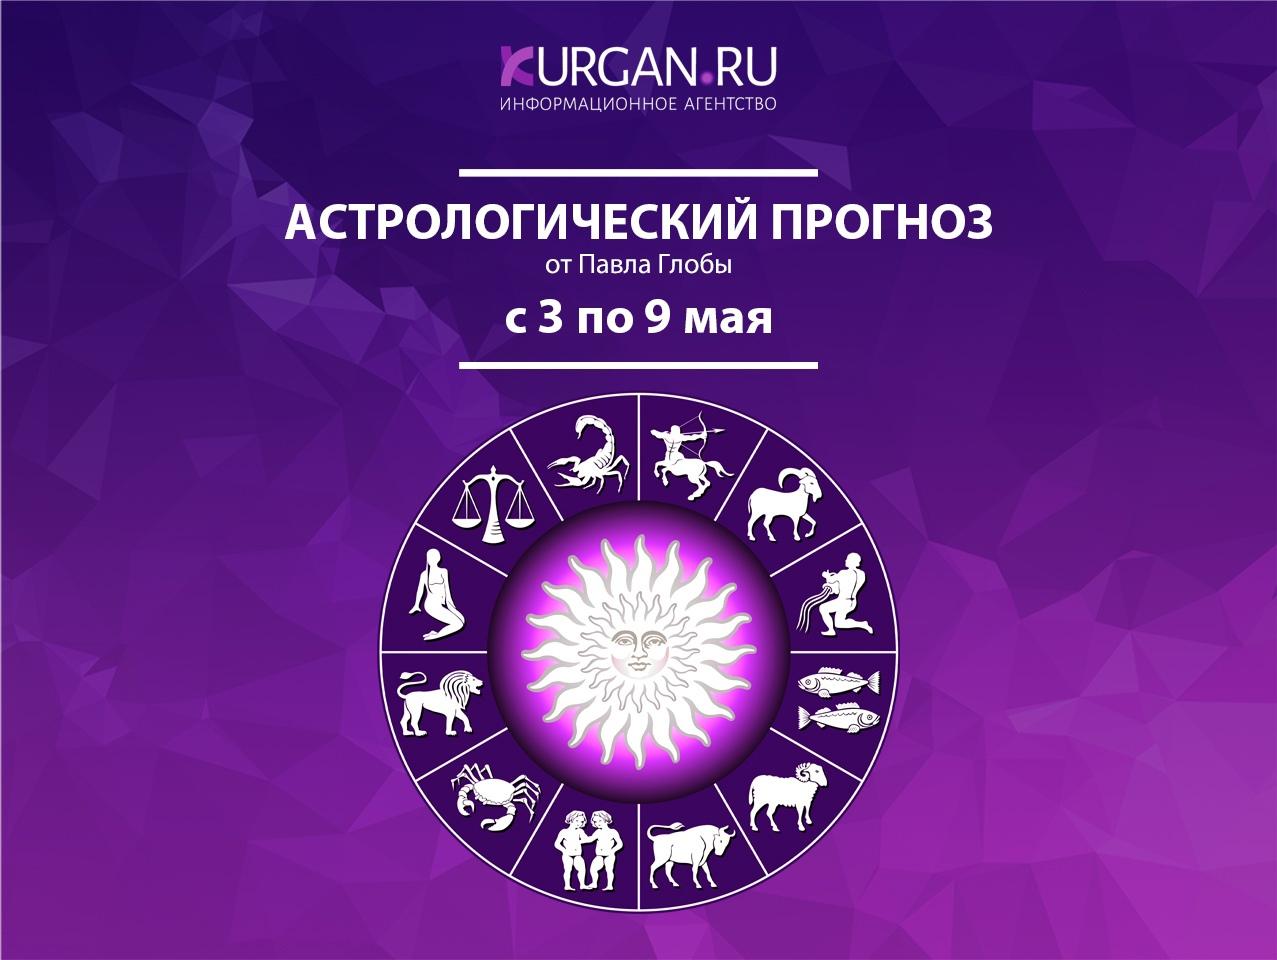 astrologicheskij goroskop s 3 po 9 maya